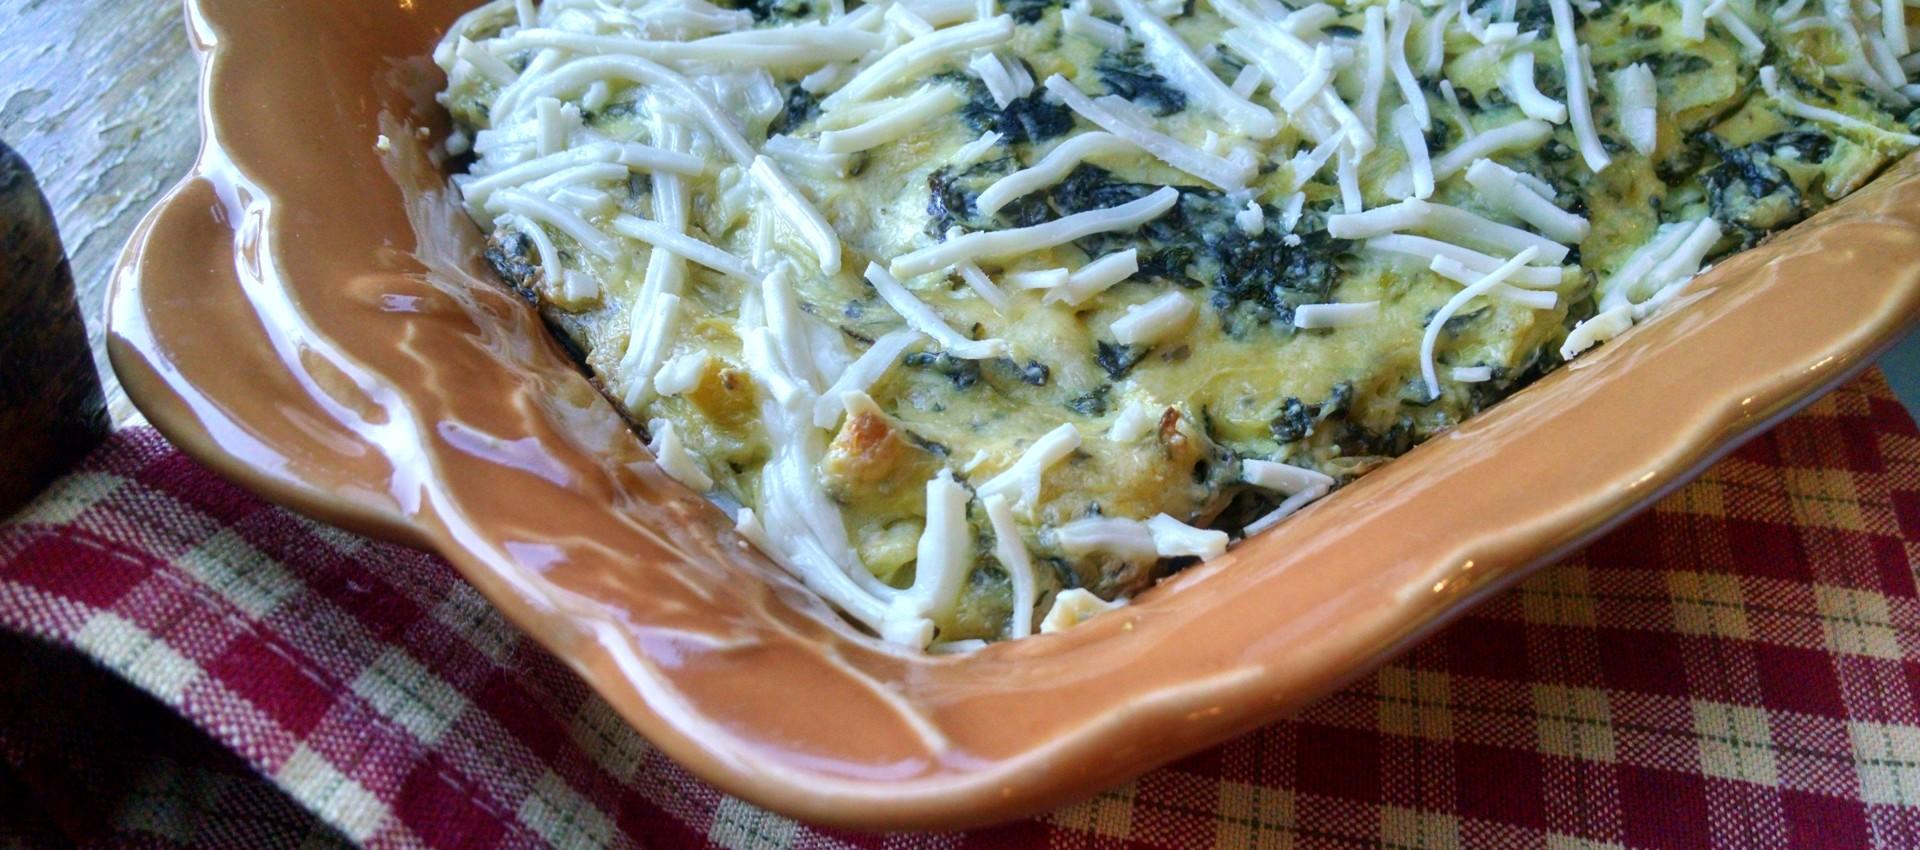 Artichoke Spinach Dip Vegans Eat What Vegans Eat What